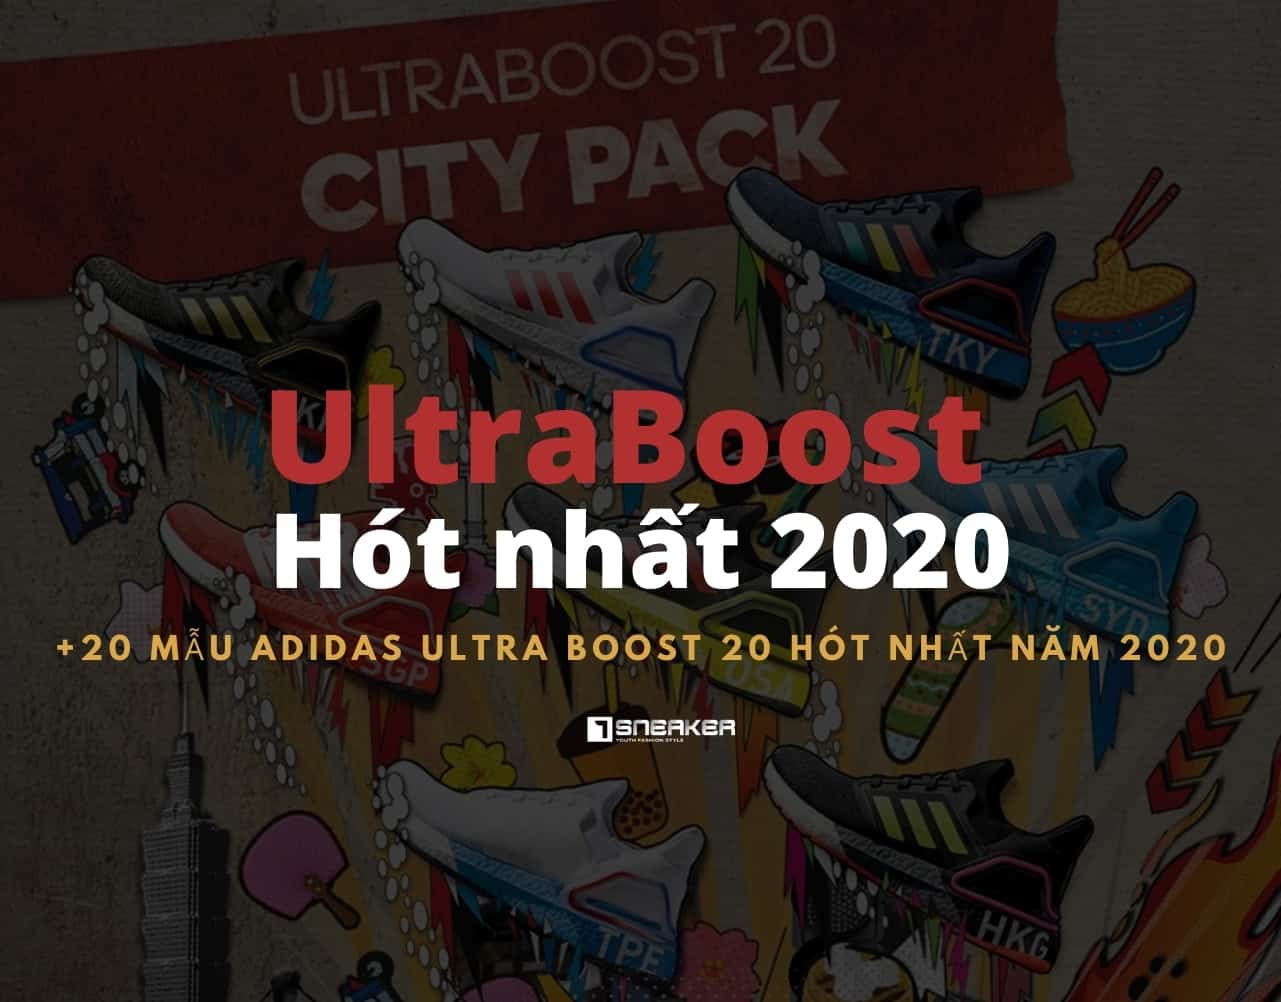 20 MAU ADIDAS ULTRA BOOST 20 hot nhat nam 2020